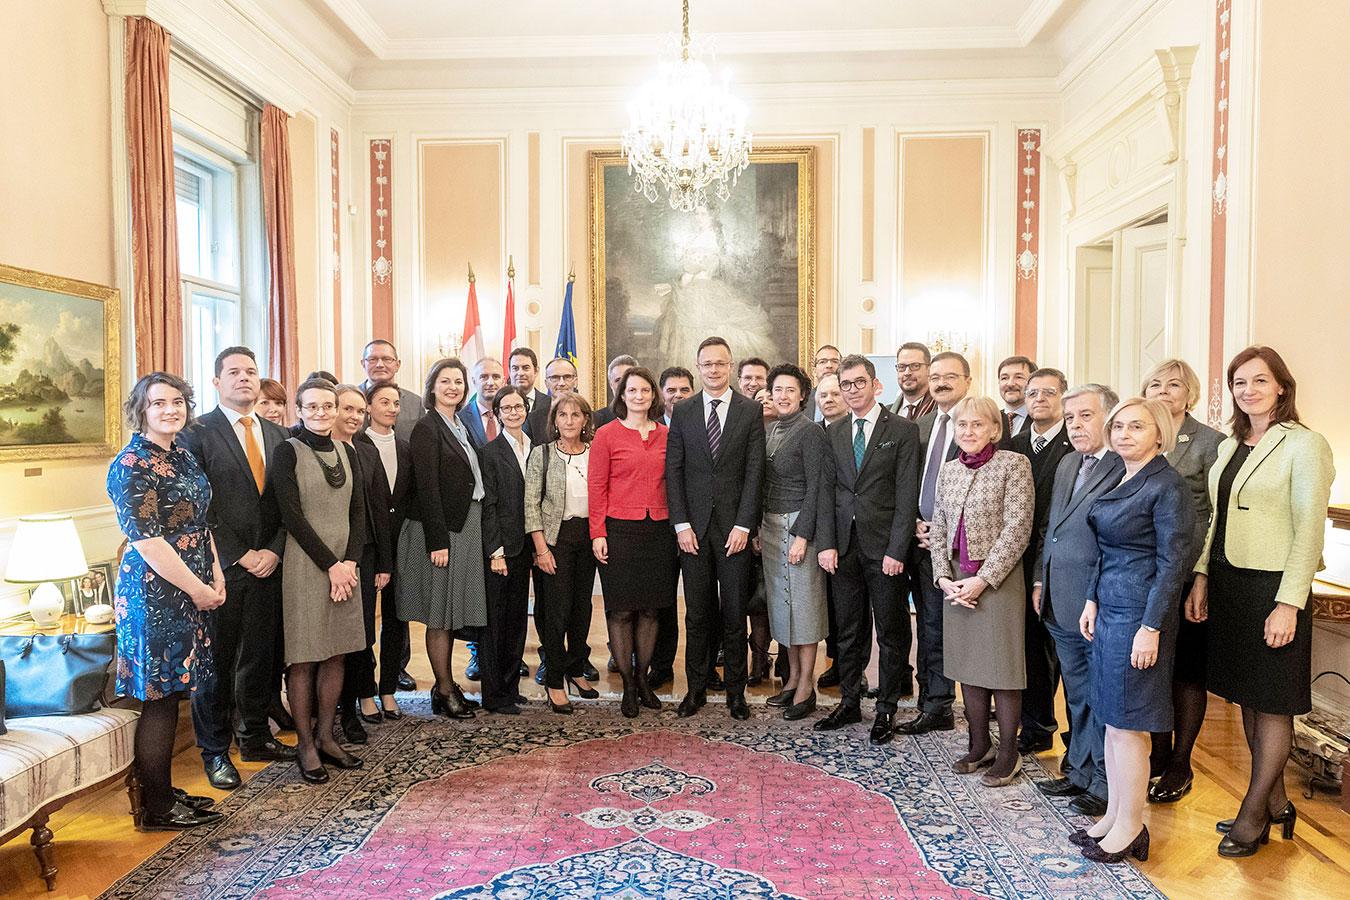 a-elisabeth-ellison-kramer-working-luncheon-austrian-presidency-2018-group.jpg